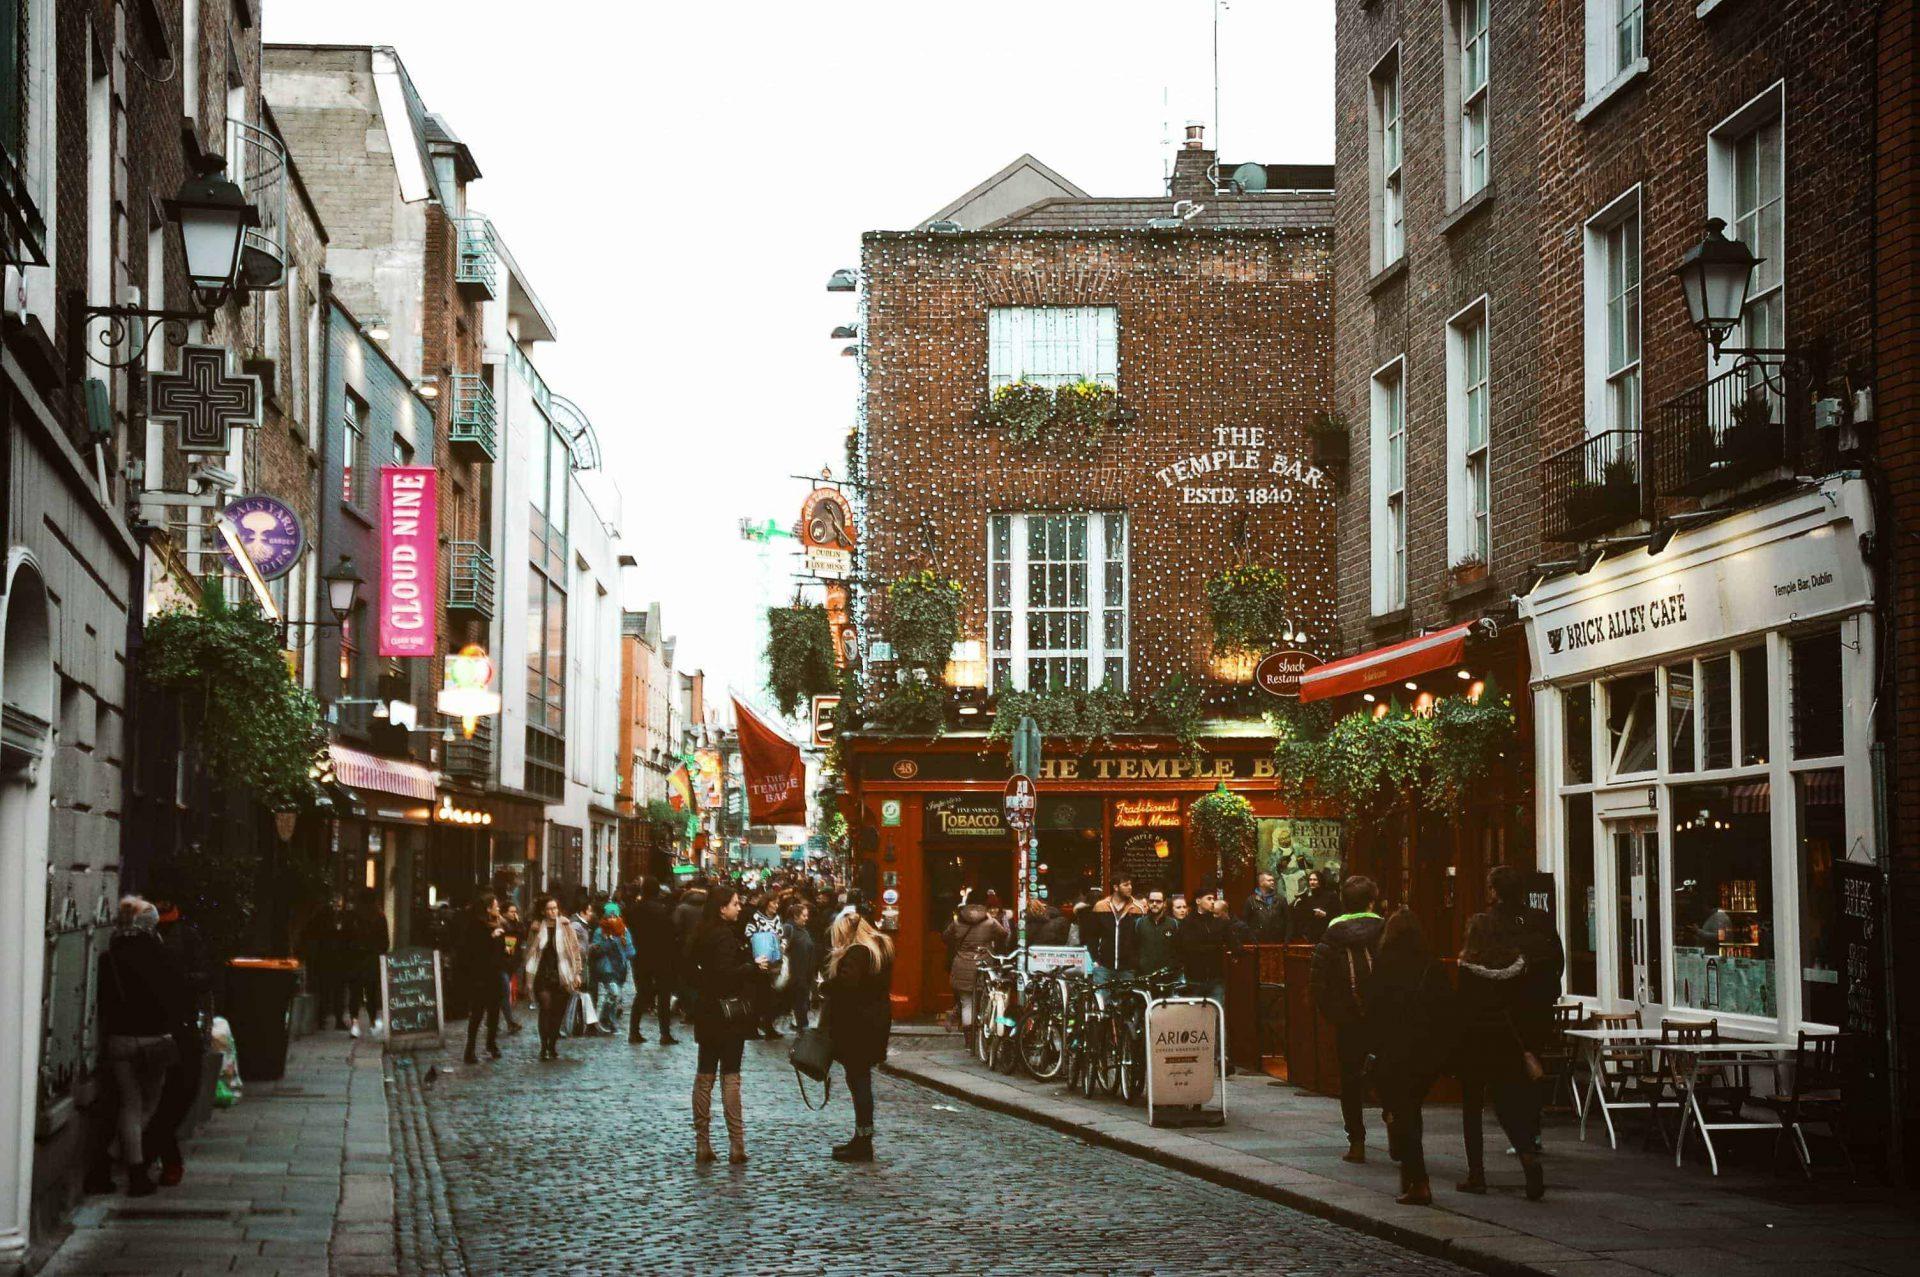 diogo palhais 549749 unsplash - De 8 leukste goedkope hotels in Dublin voor je stedentrip